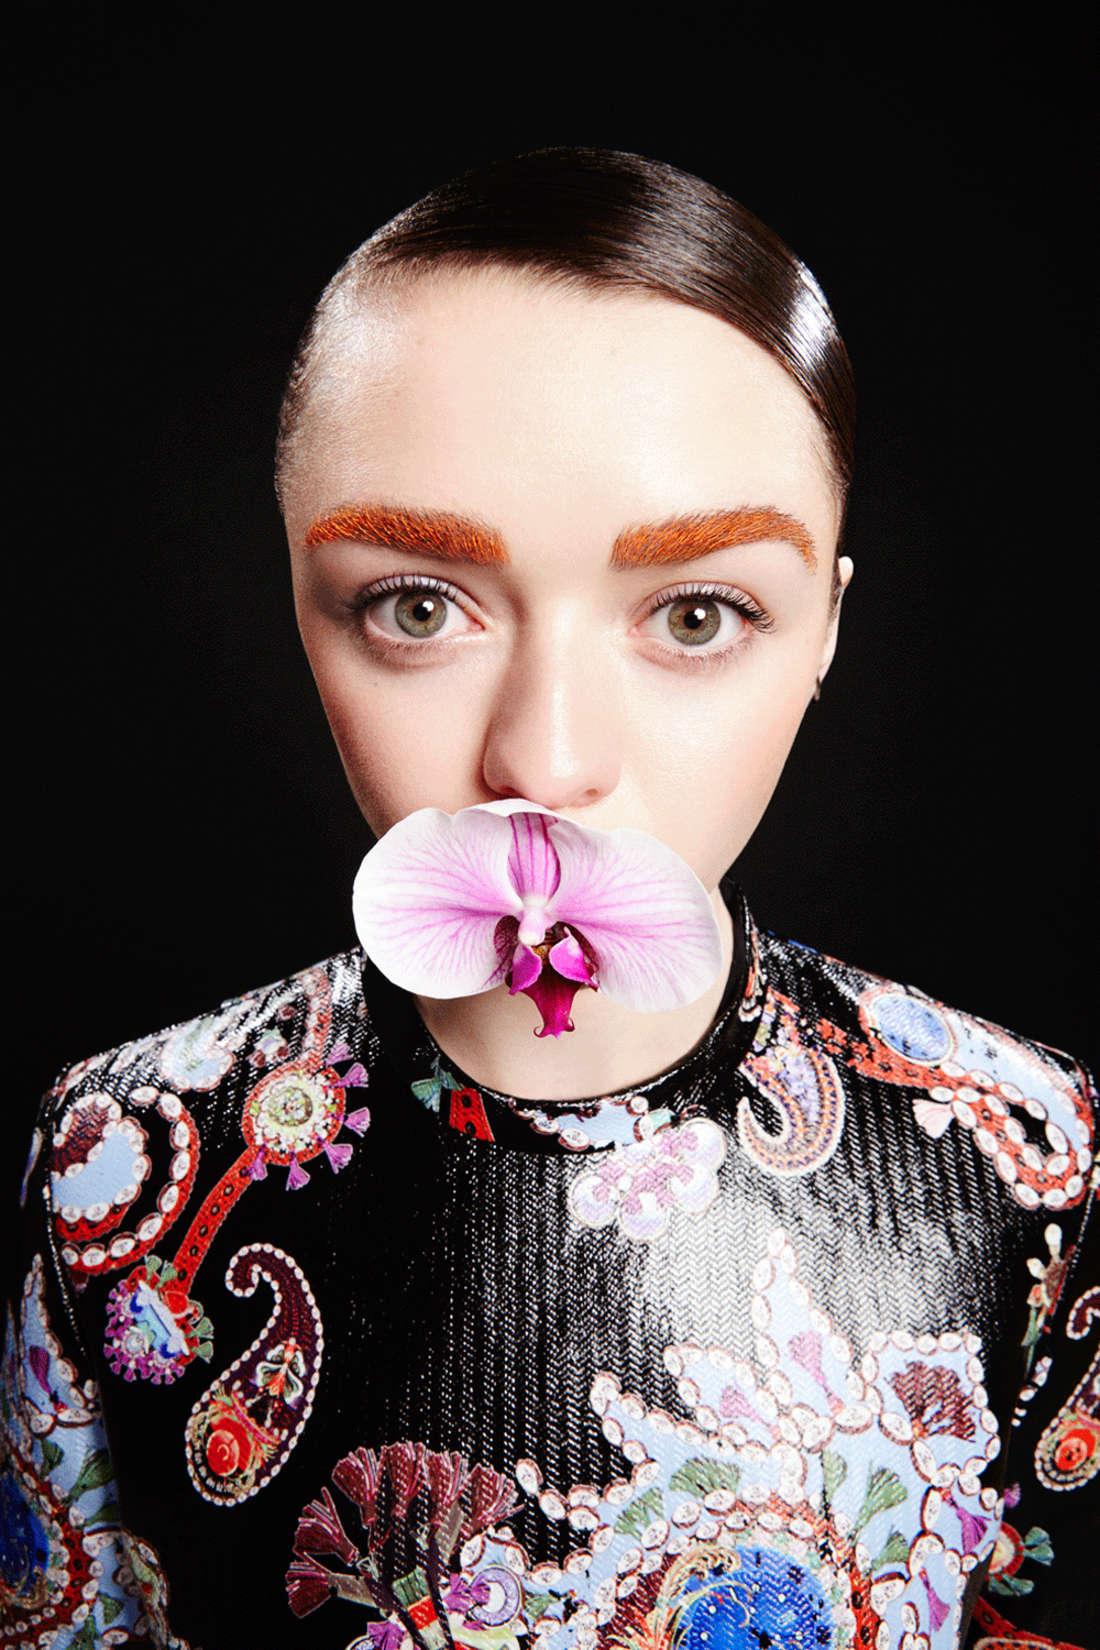 Maisie Williams - Evening Standard Photoshoot (August 2015)